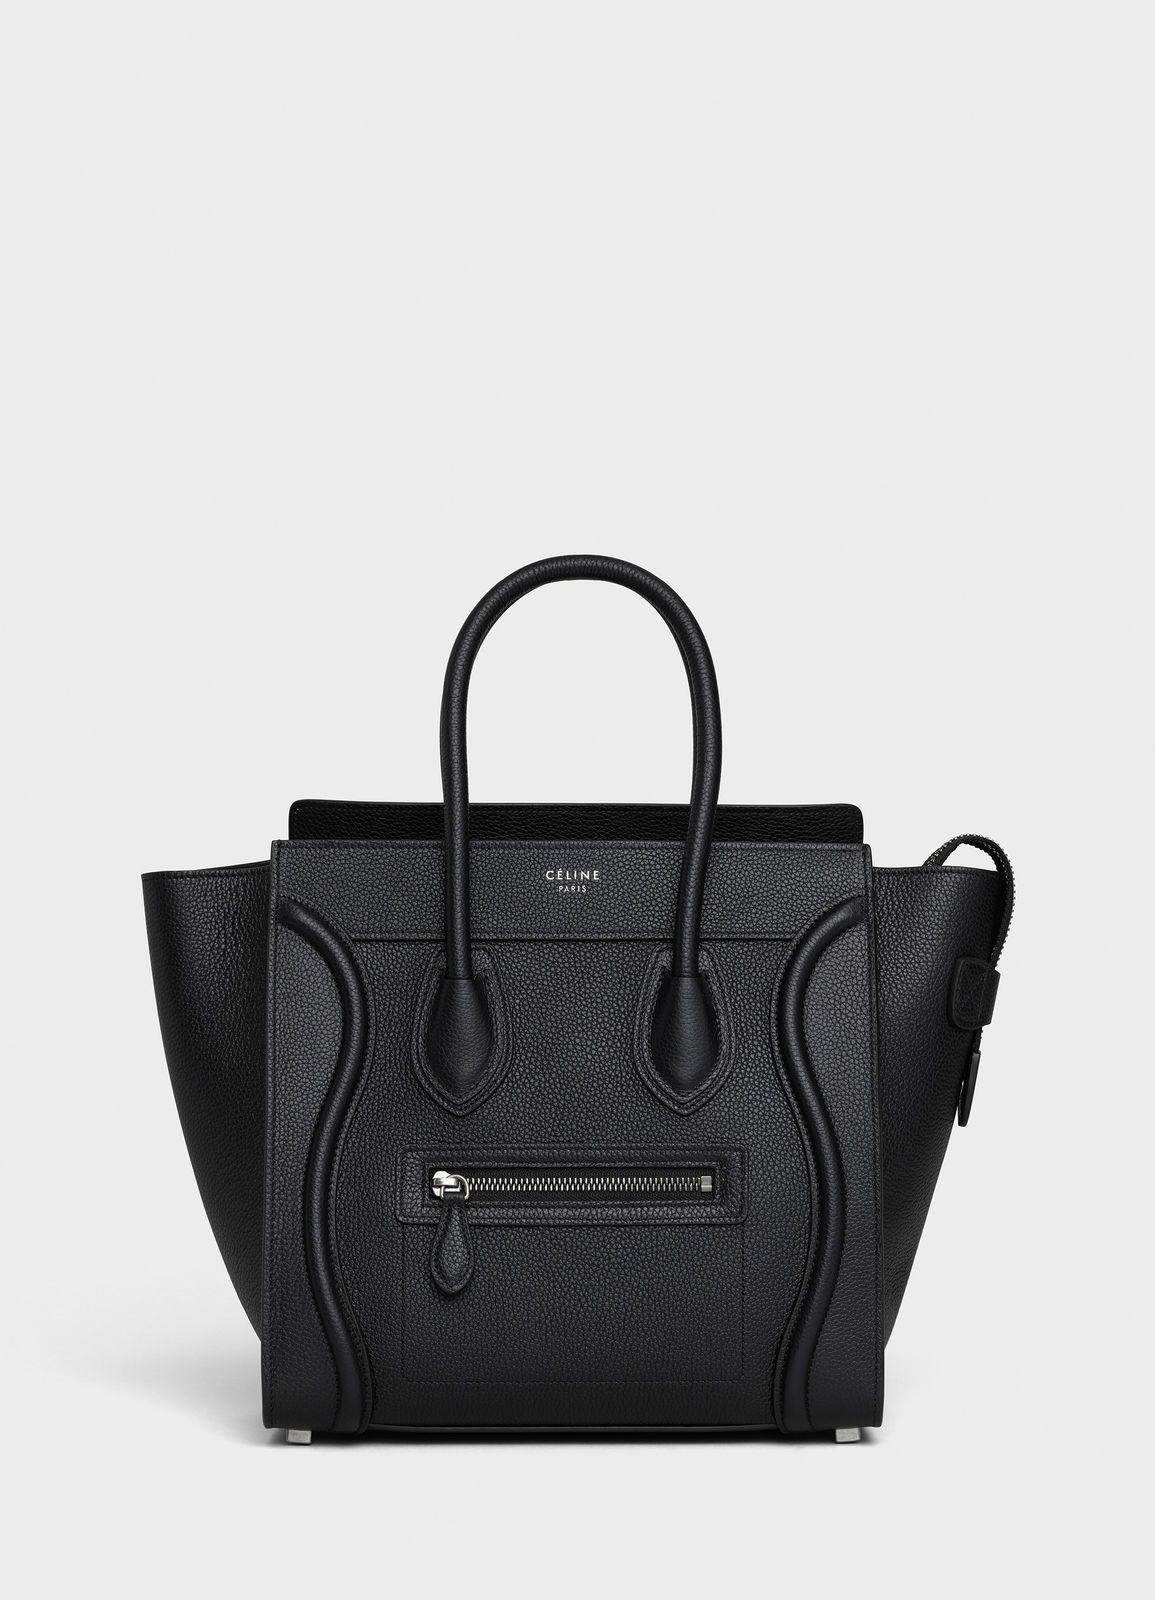 3f9ec27e3cc3 Micro Luggage handbag in drummed calfskin